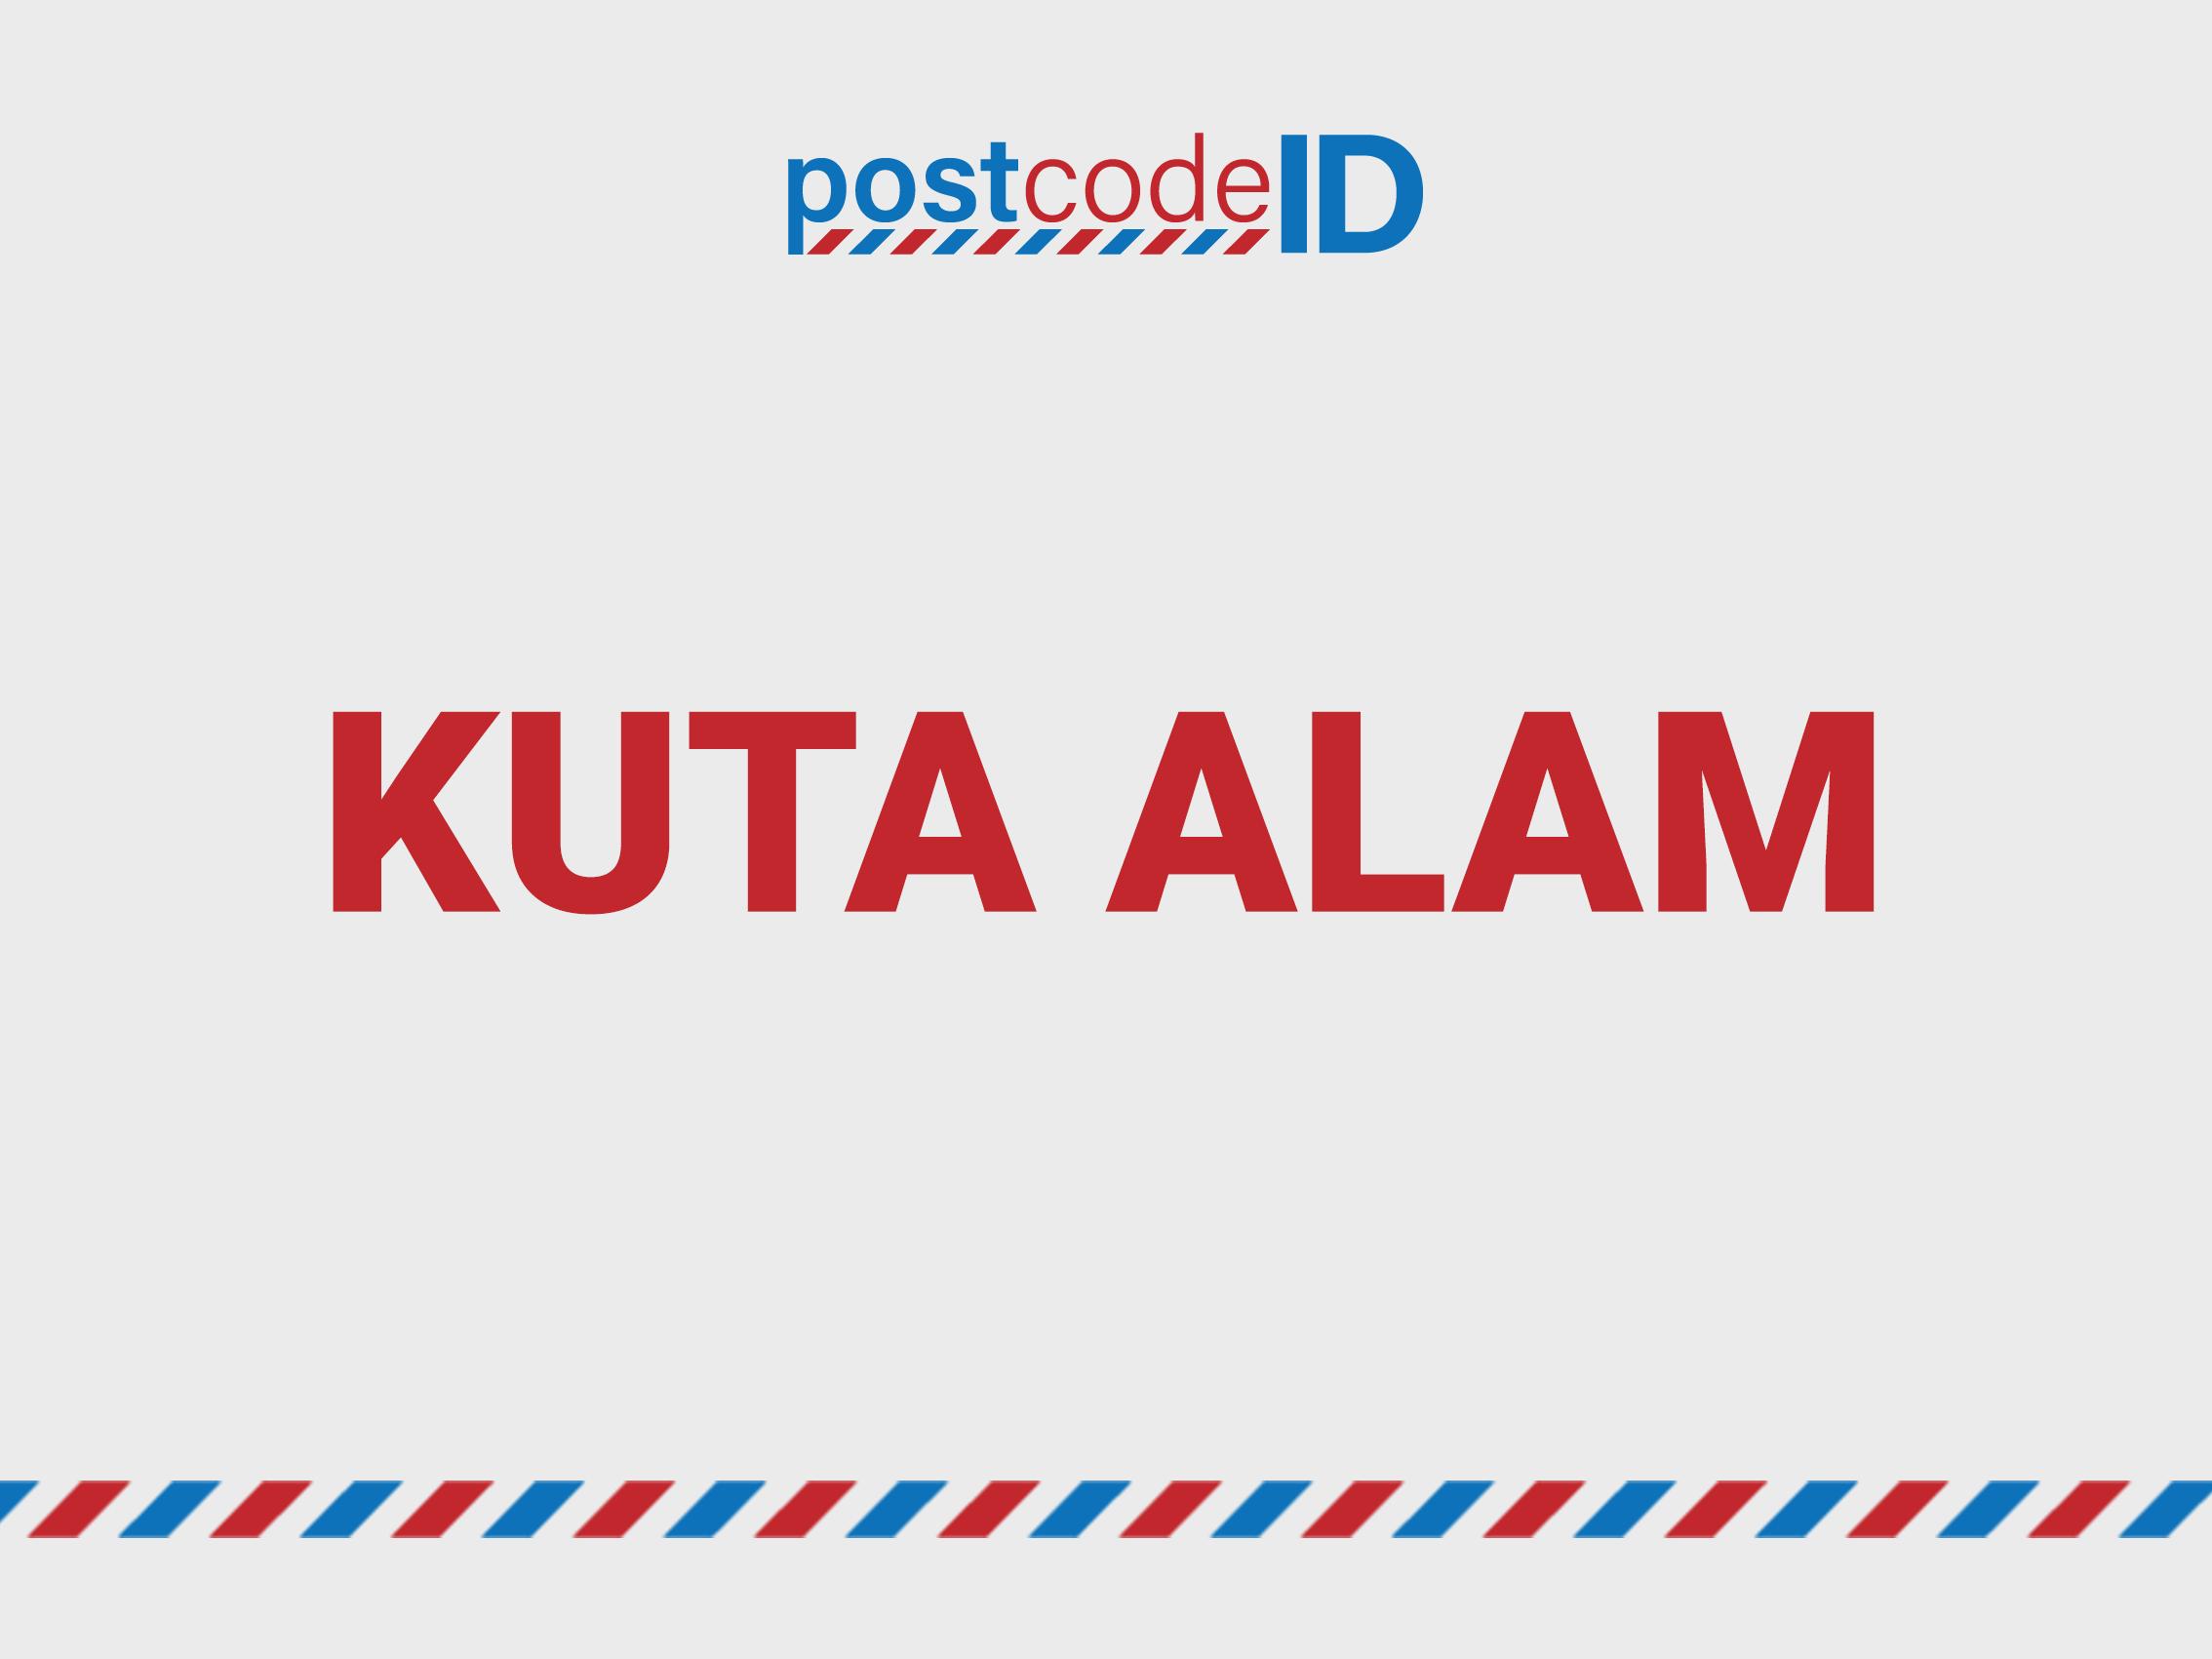 Kode Pos Kuta Alam Banda Aceh Postcode Id